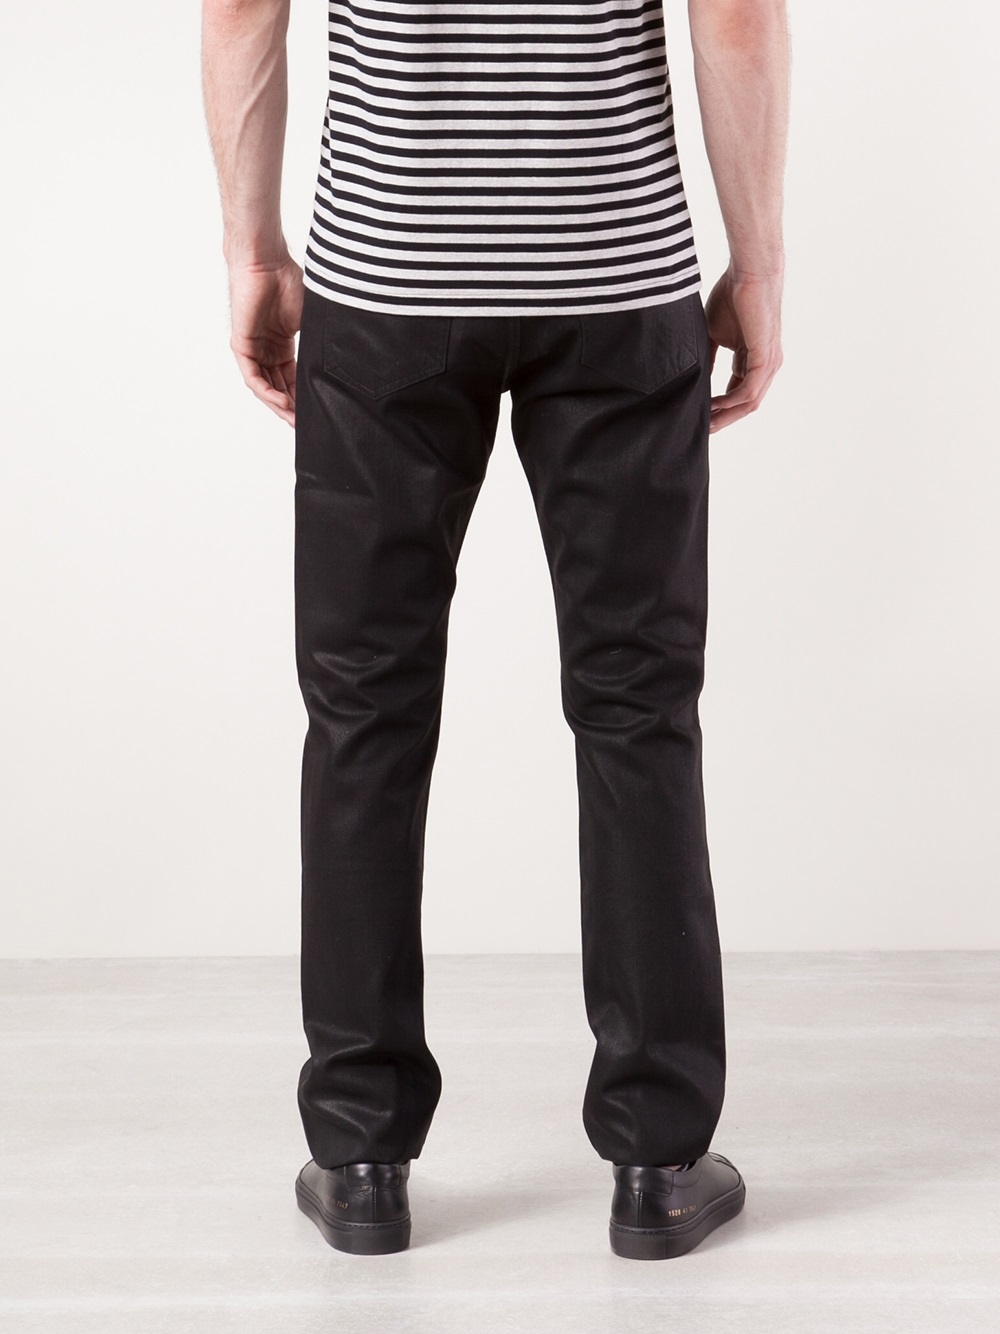 Rag & Bone Coated Jeans in Black for Men - Lyst